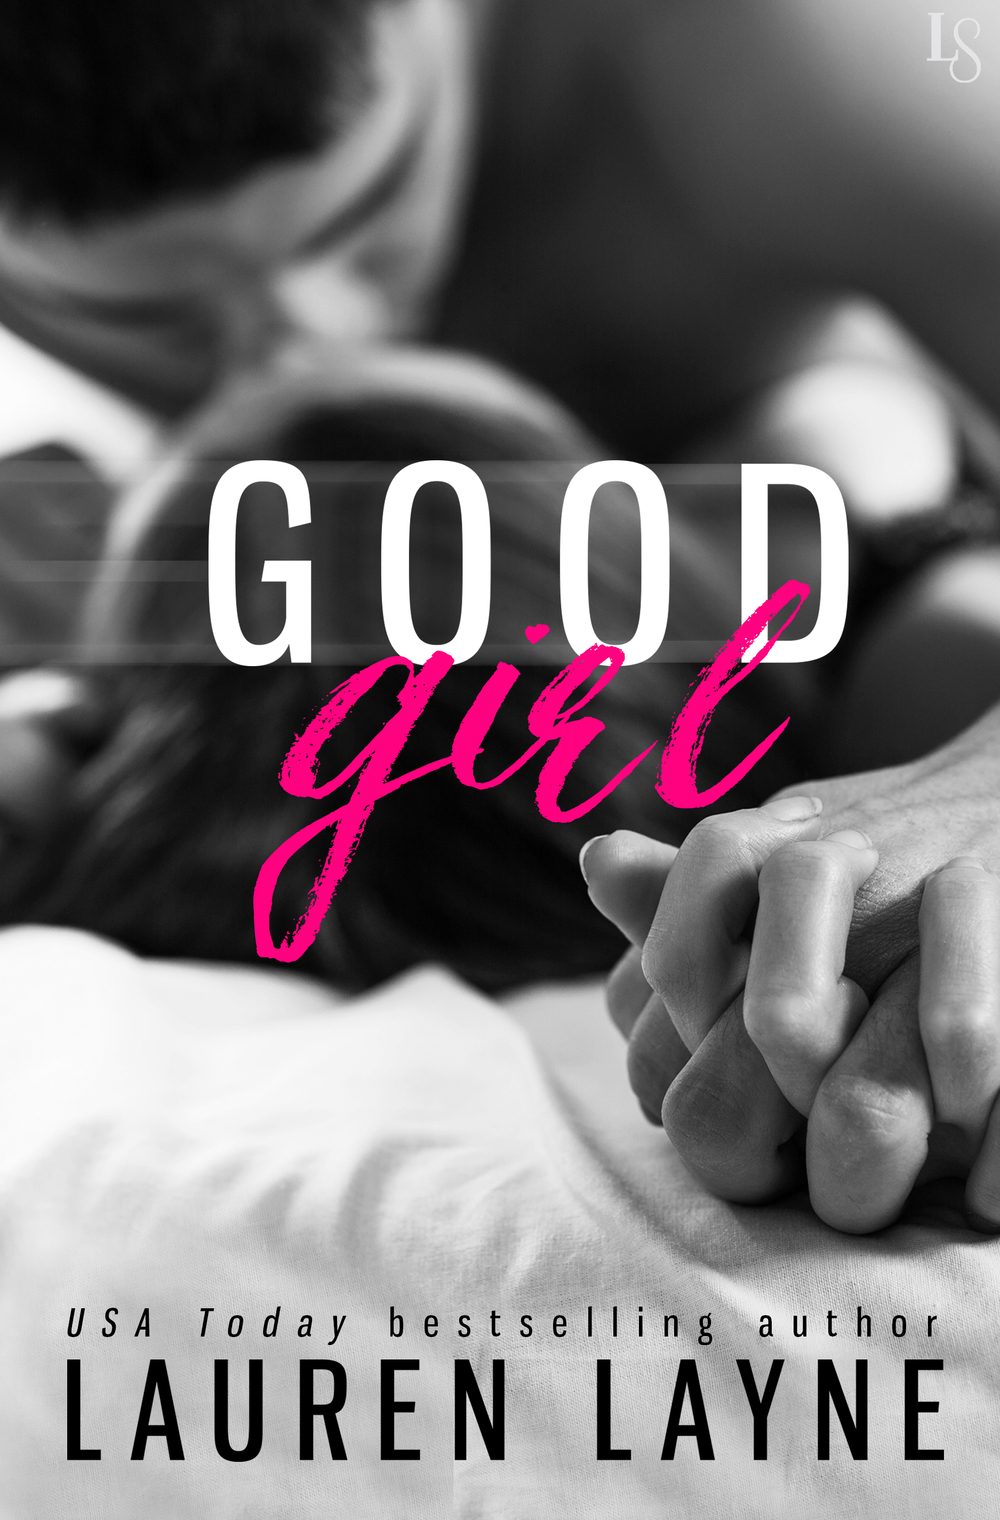 Good Girl by Lauren Layne